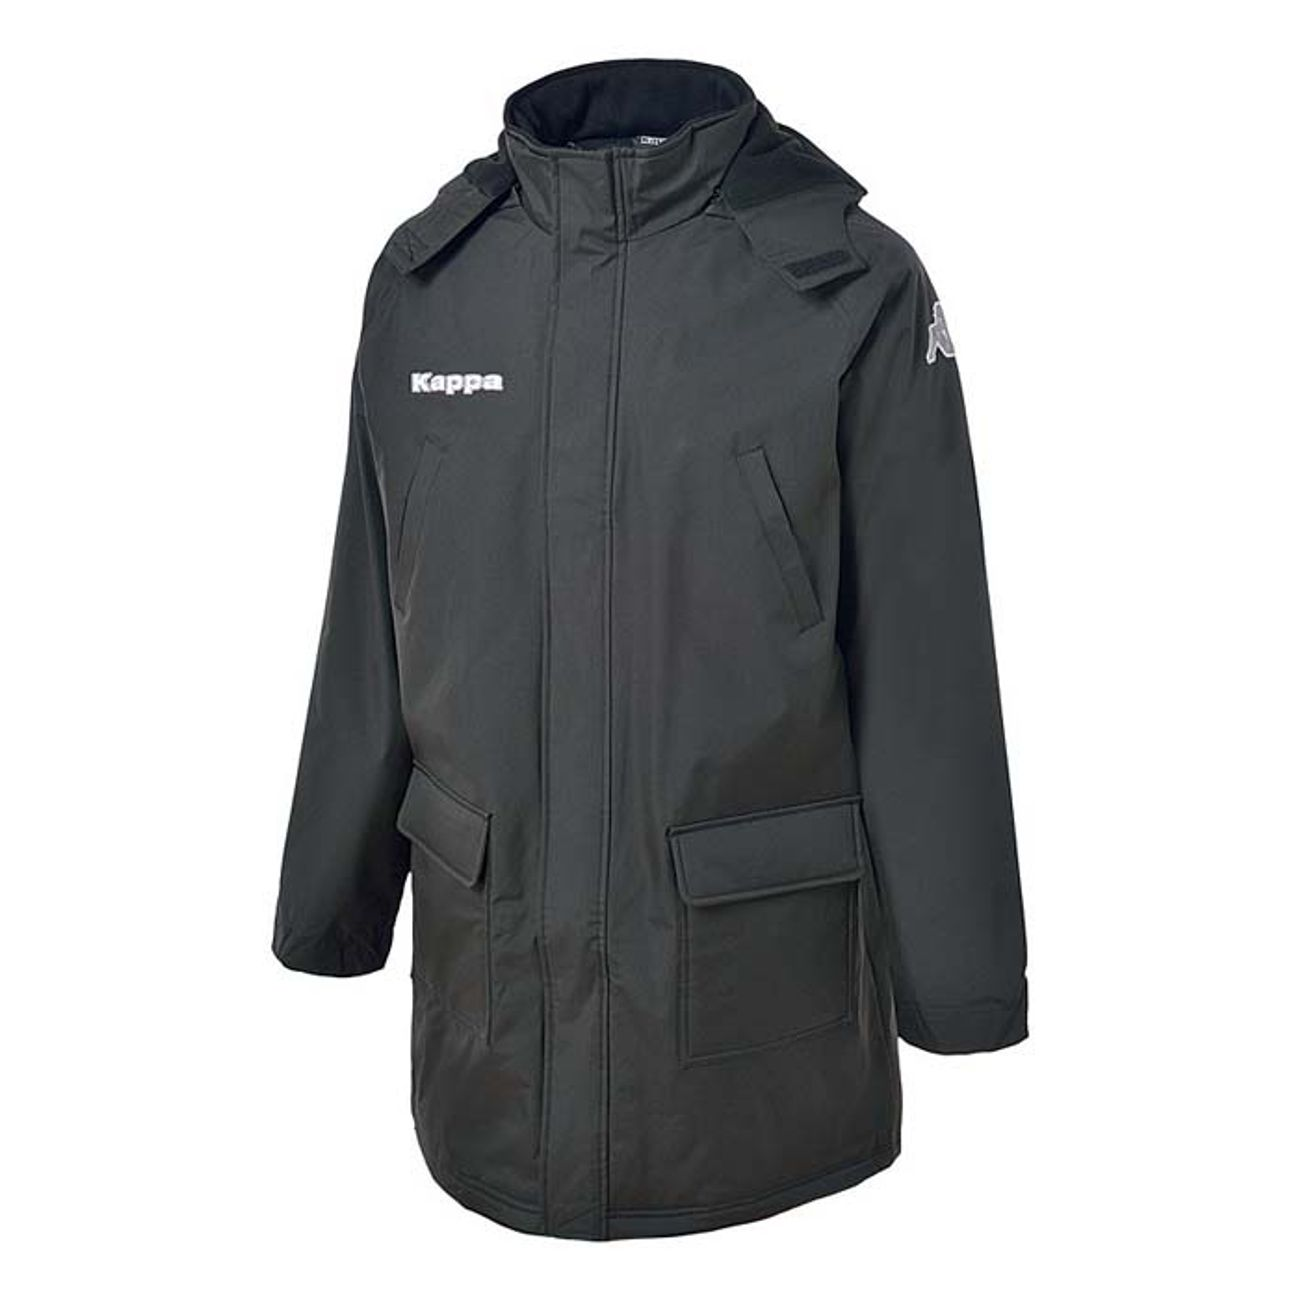 97a769f47d1f2 kappa-mateo-jacket-long-parka 1 v3.jpeg